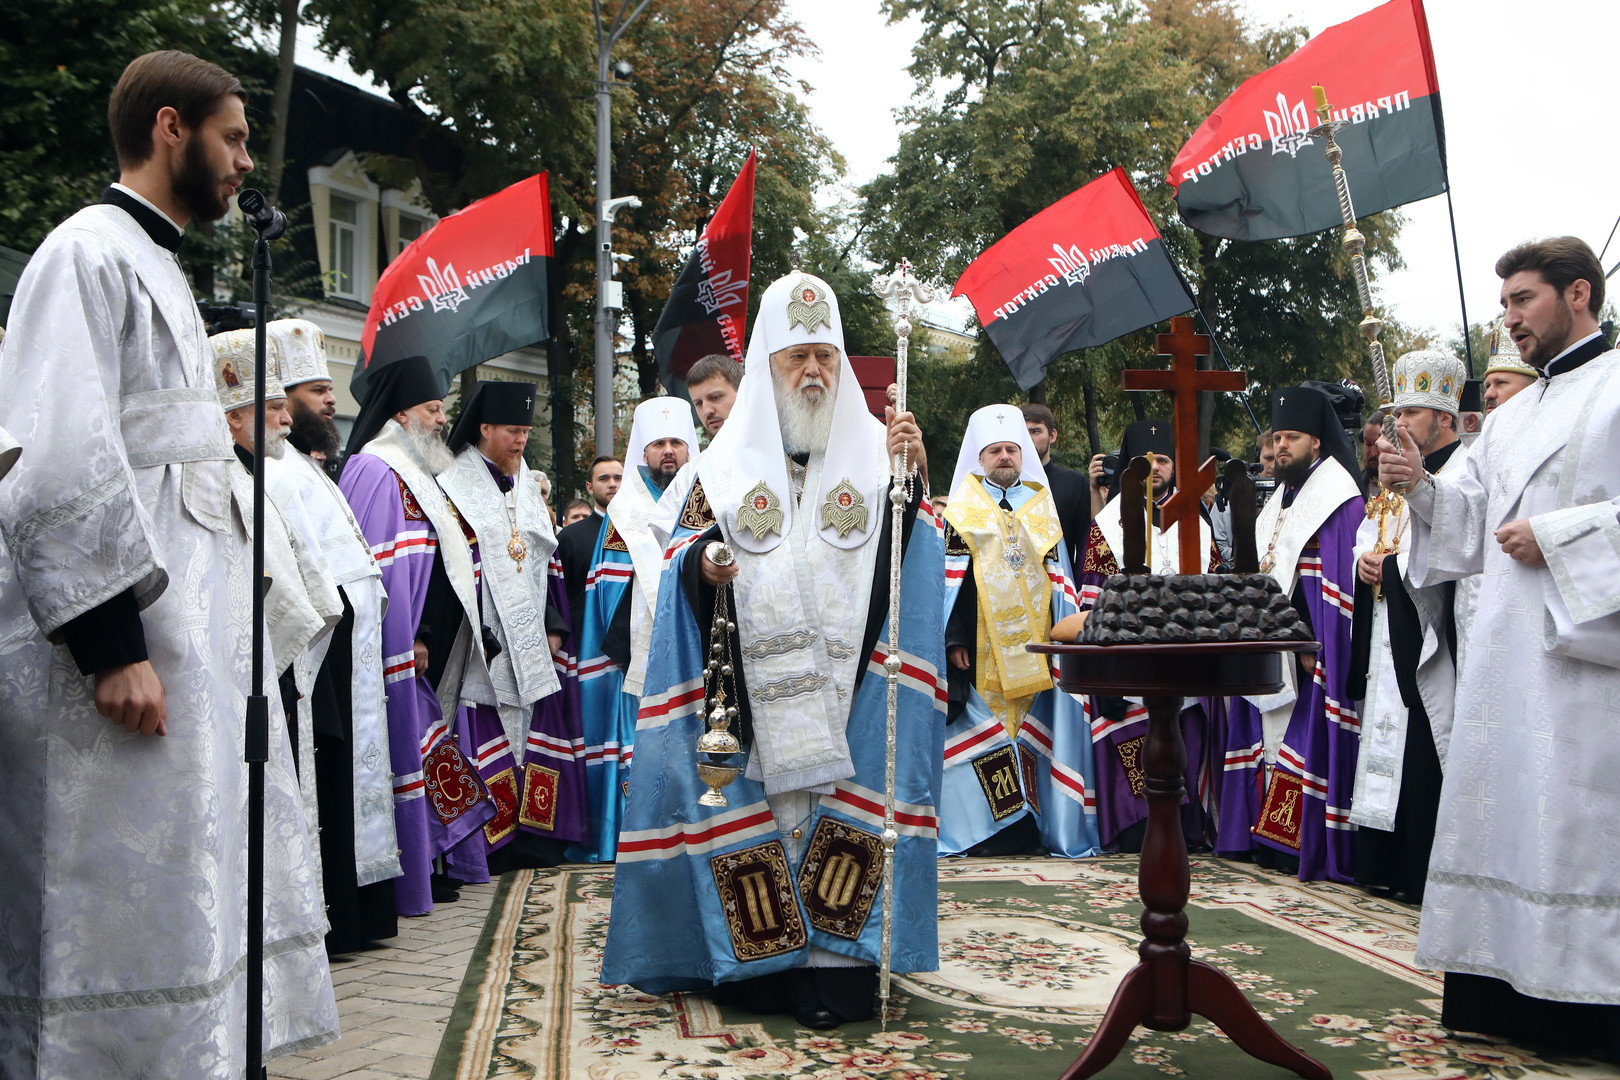 Orthodoxie ist kurz vor Spaltung: Patriarch Bartholomeos will Kiew Autokephalie gewähren